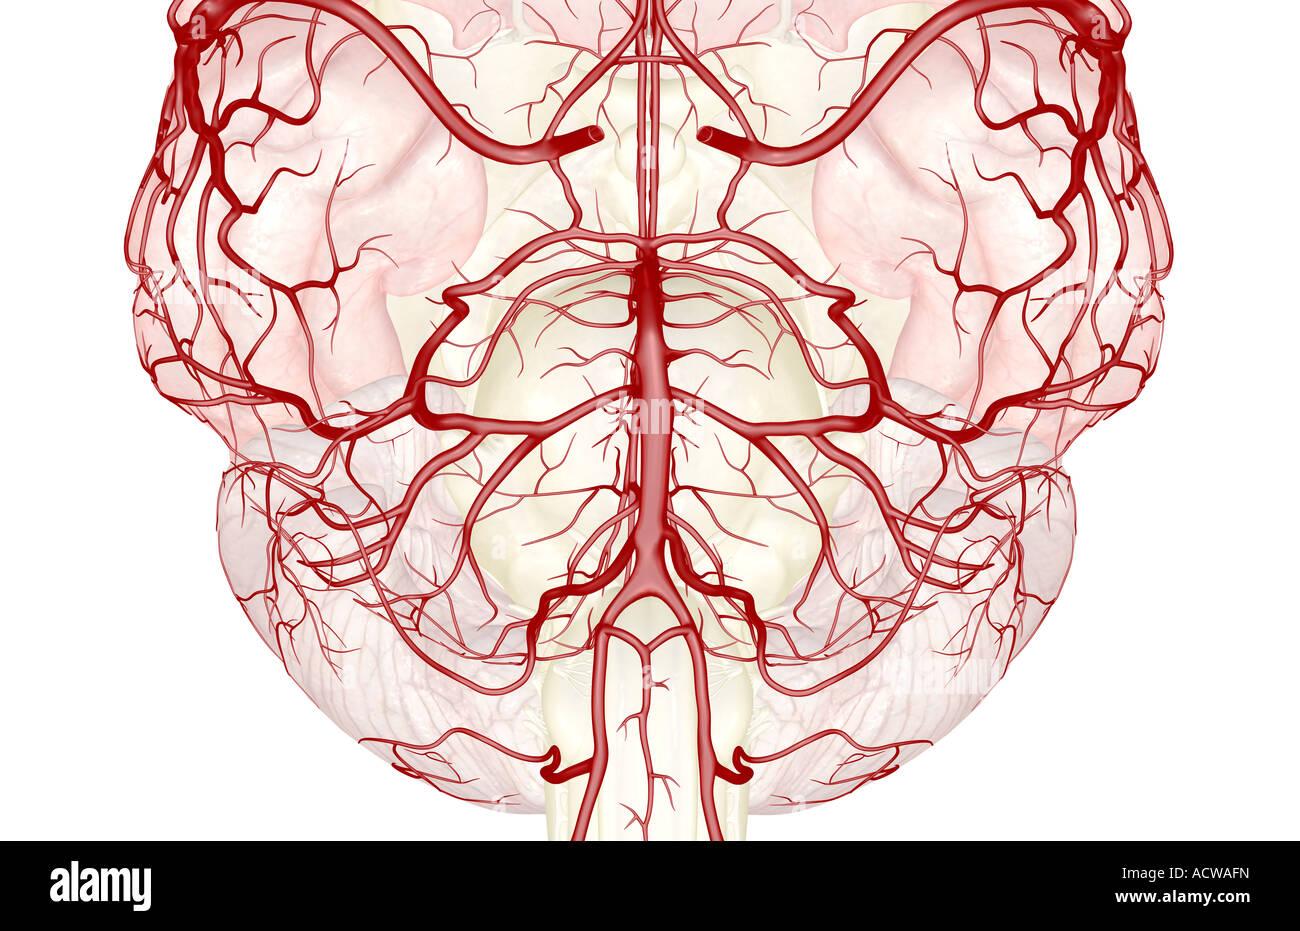 Circulus arteriosus cerebri Stockfoto, Bild: 13234328 - Alamy